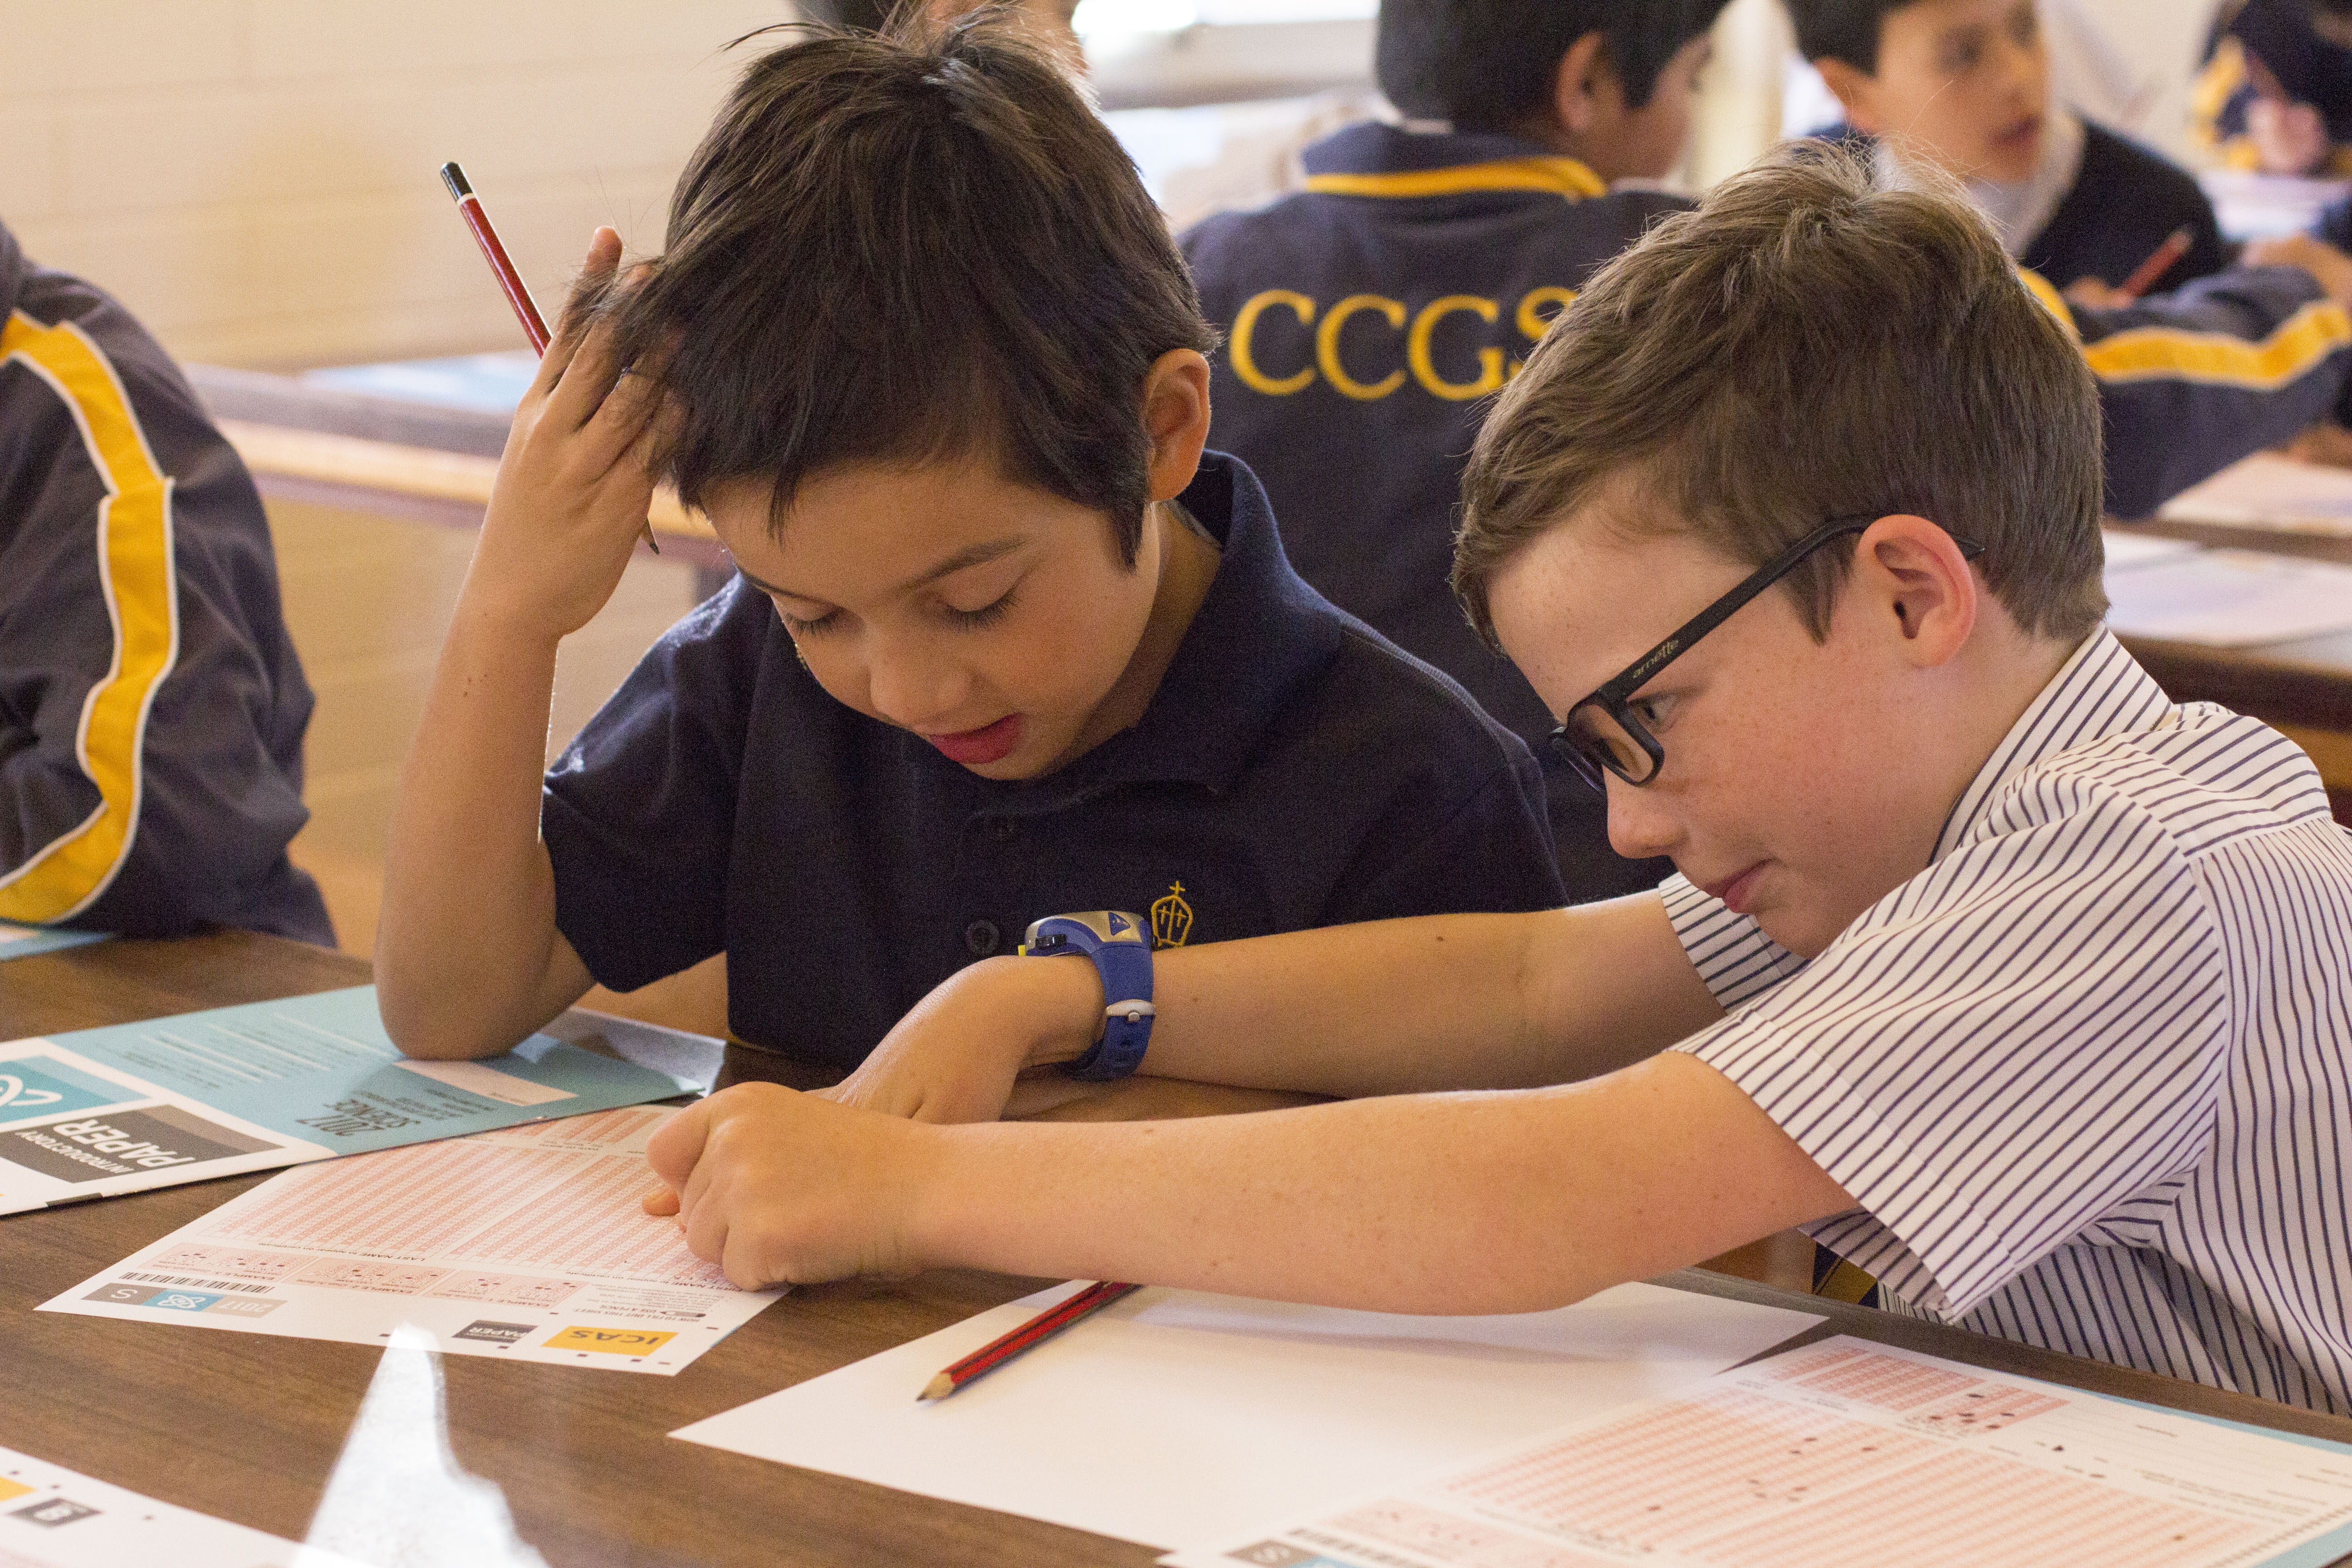 Problem-solving skills shine at ICAS - CCGS Christ Church Grammar School